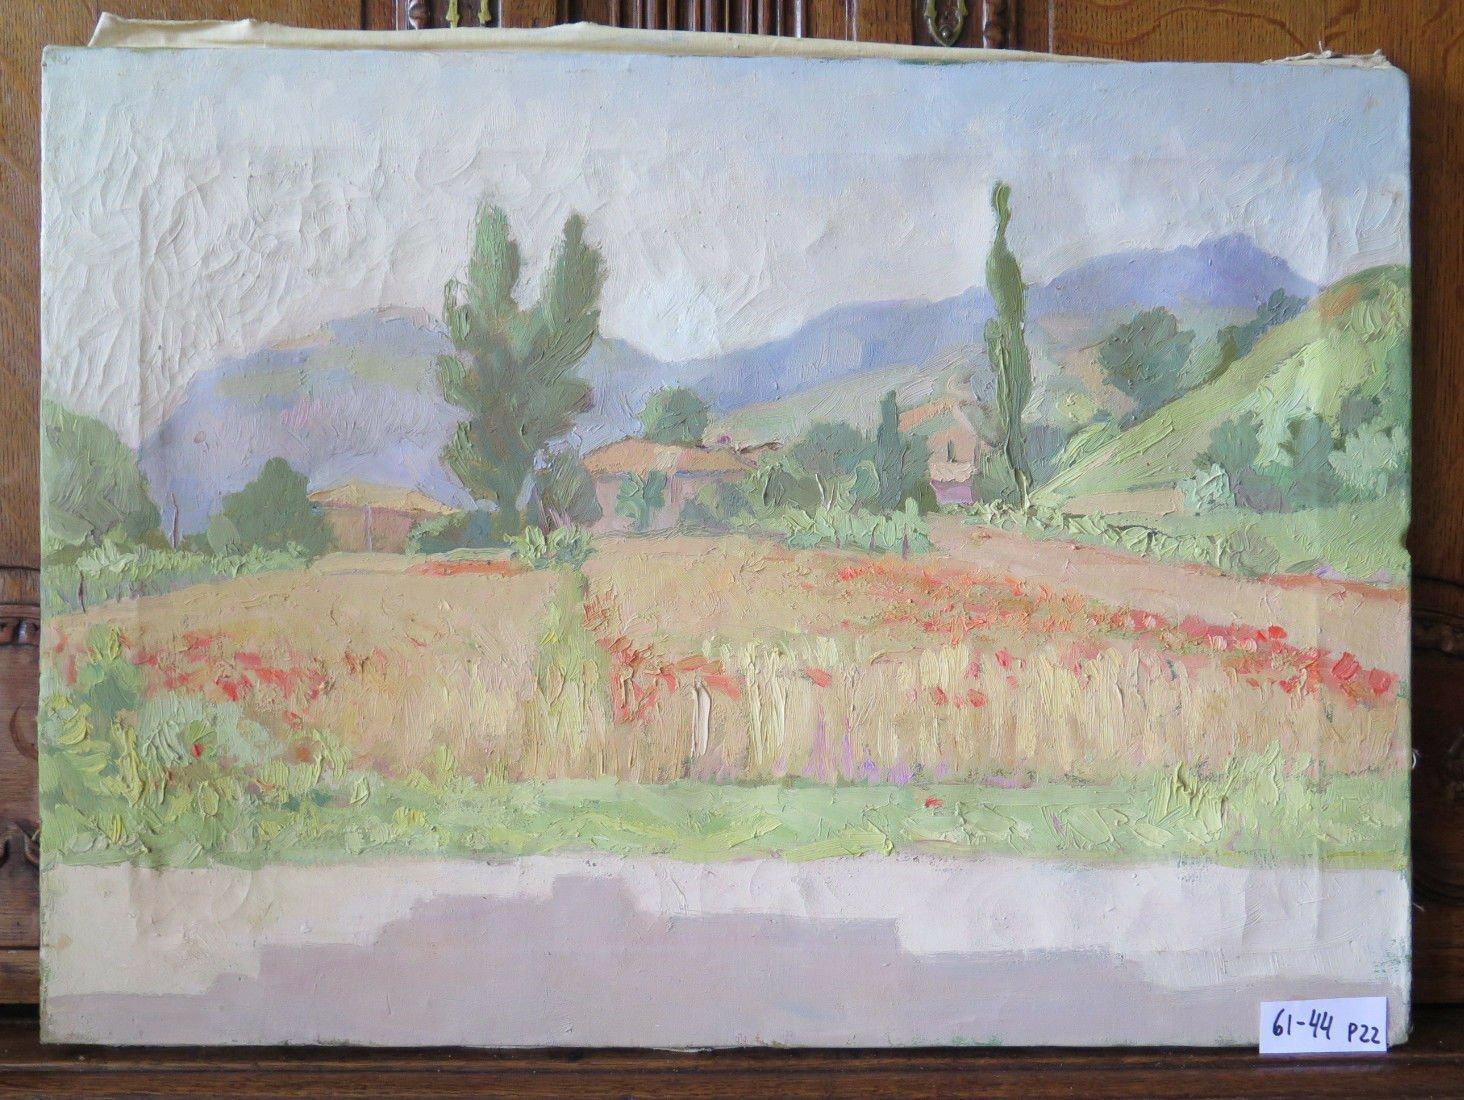 Antique Painting to Oil on Linen Landscape Countryside Emilia Romagna OEM P22